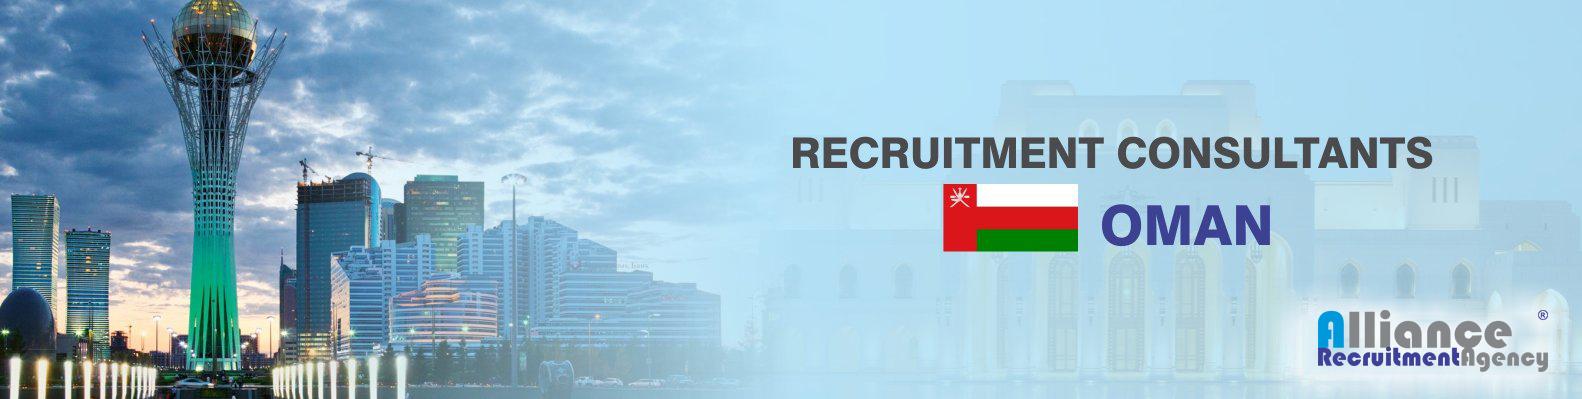 oman recruitment consultants